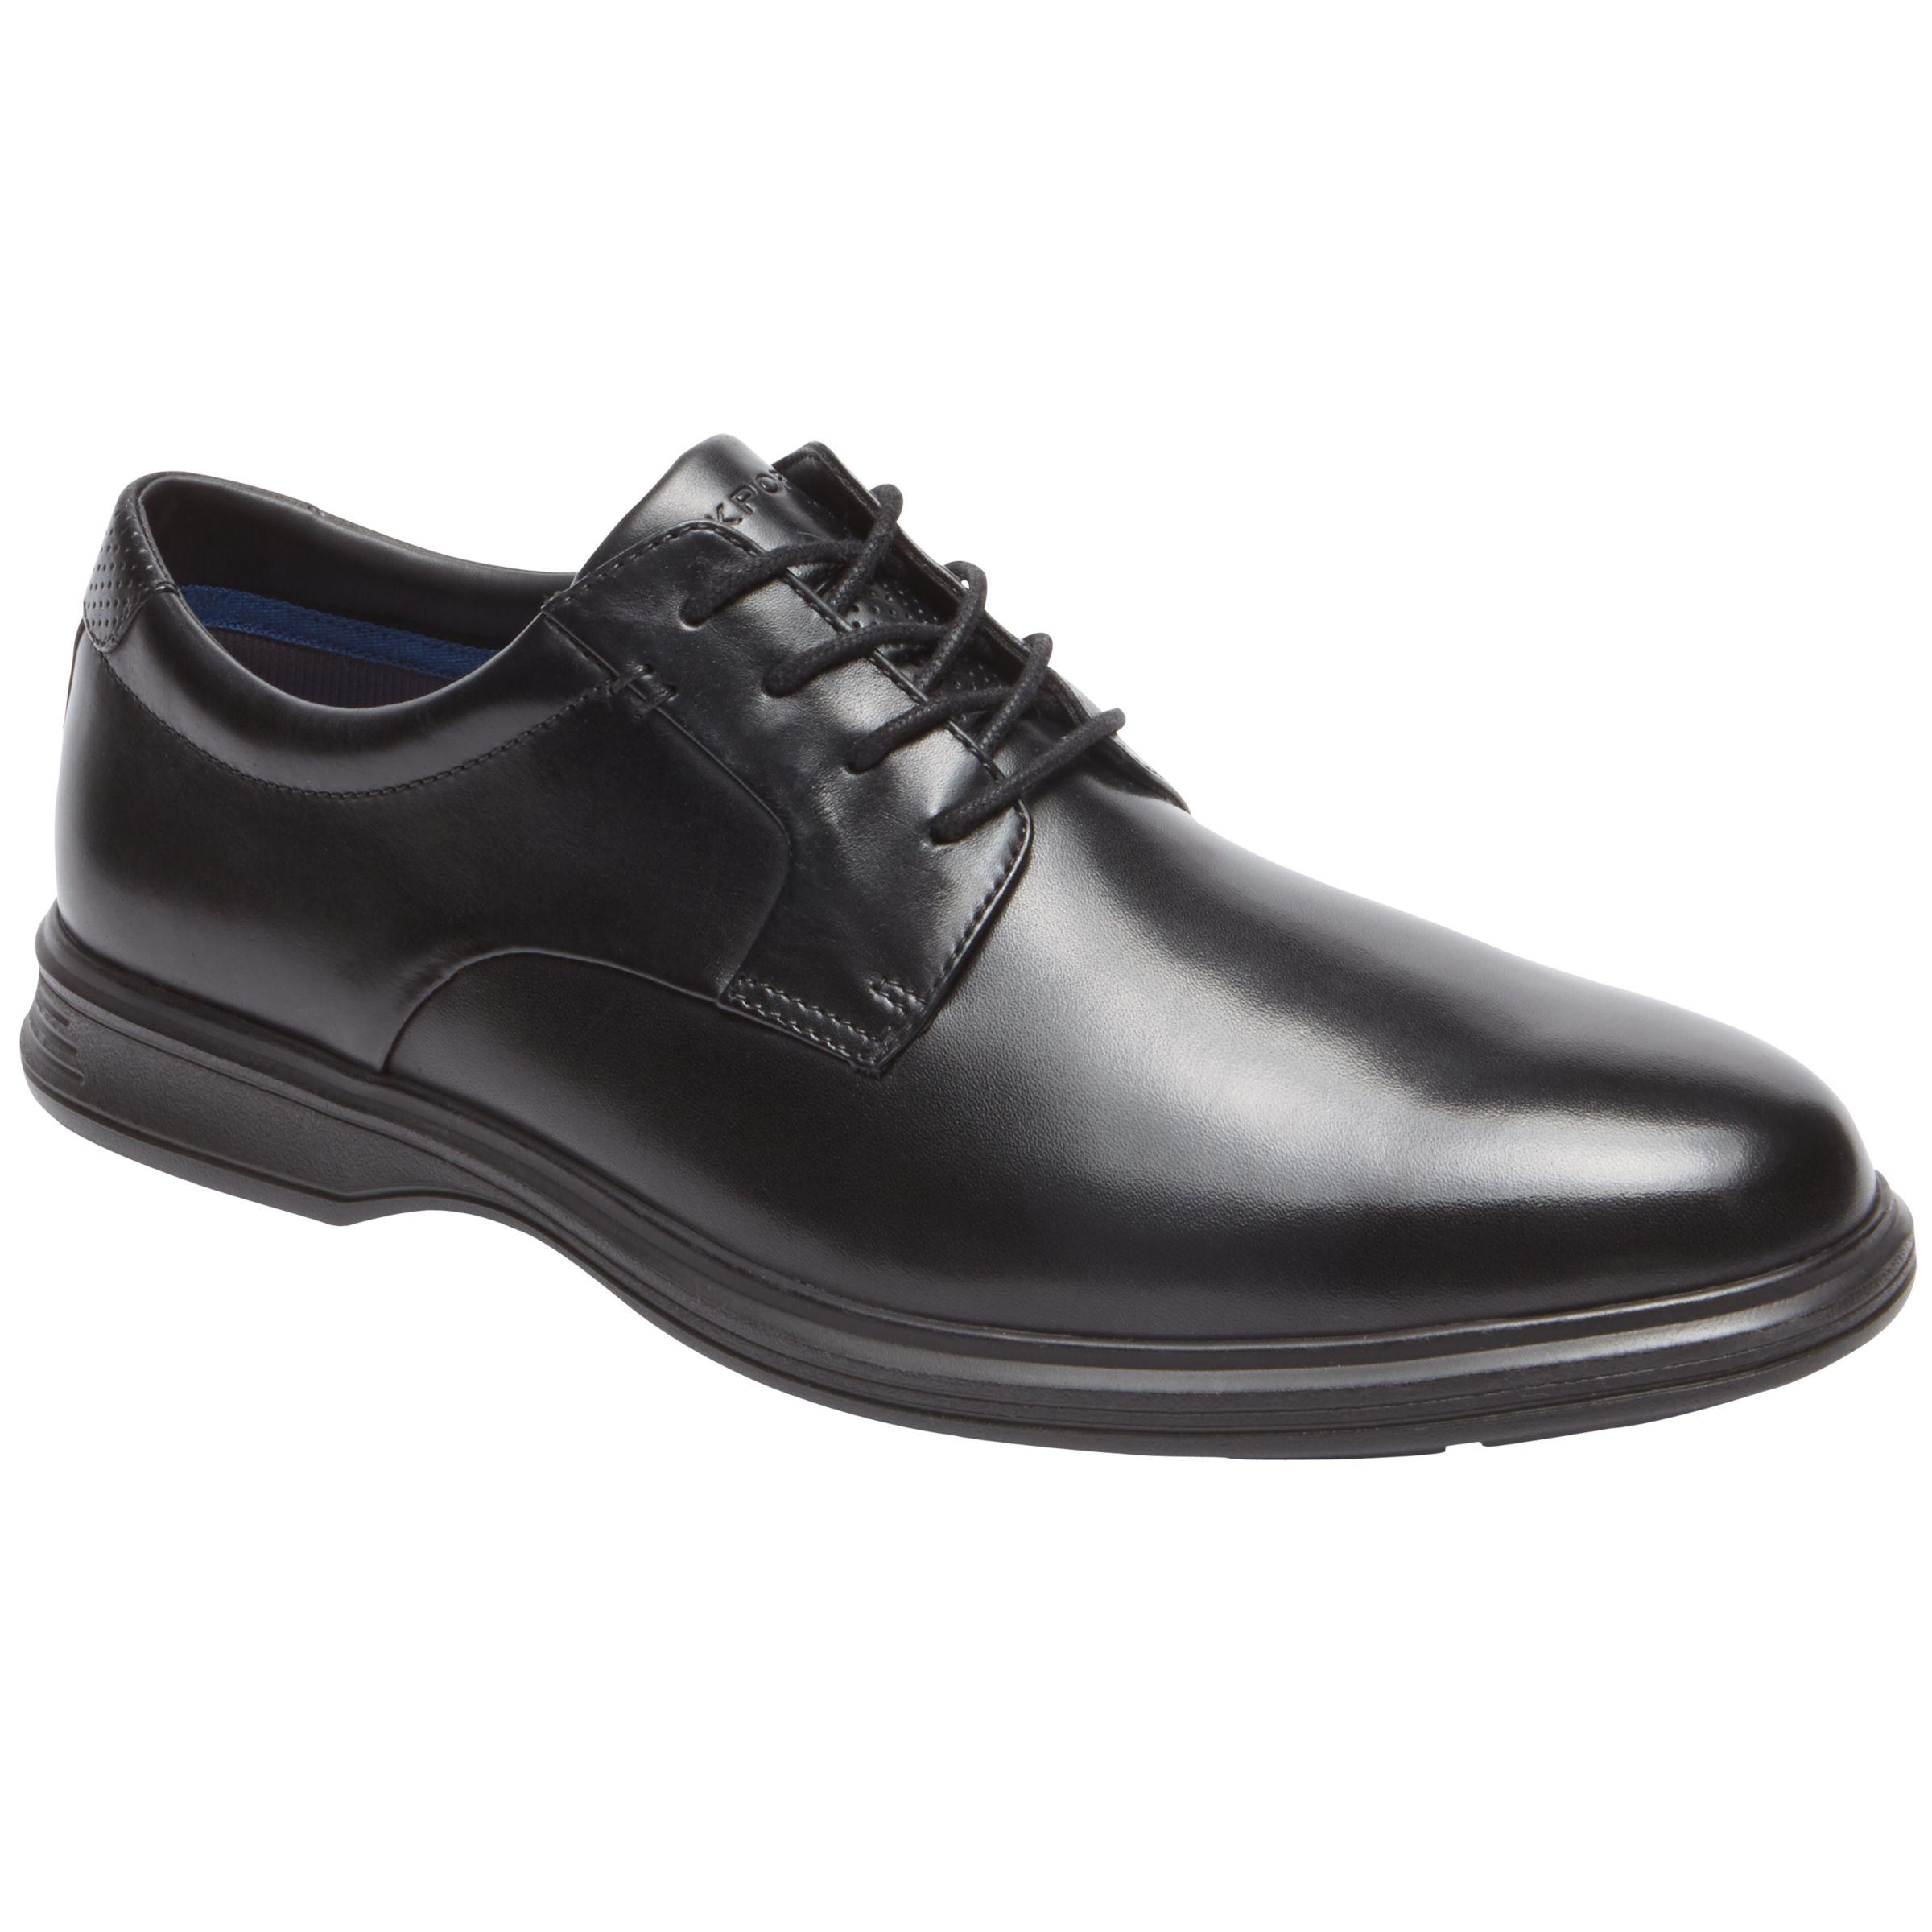 Rockport Rockport Dressports 2 Plus Plain Toe Shoes, Black